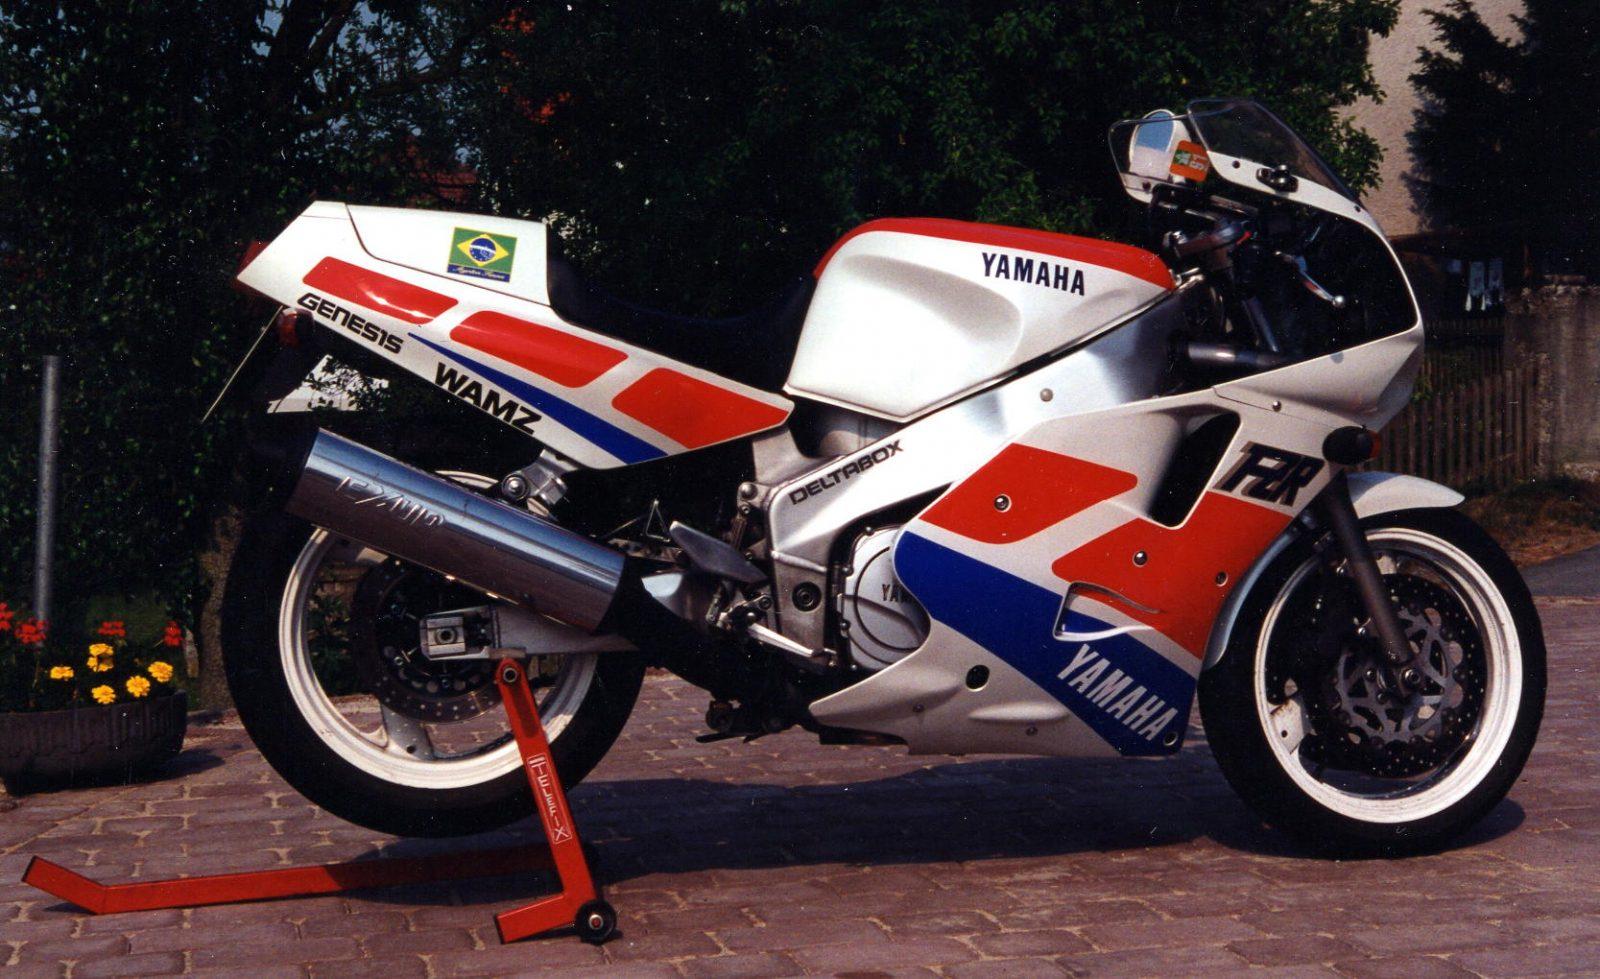 1994 Yamaha FZR1000